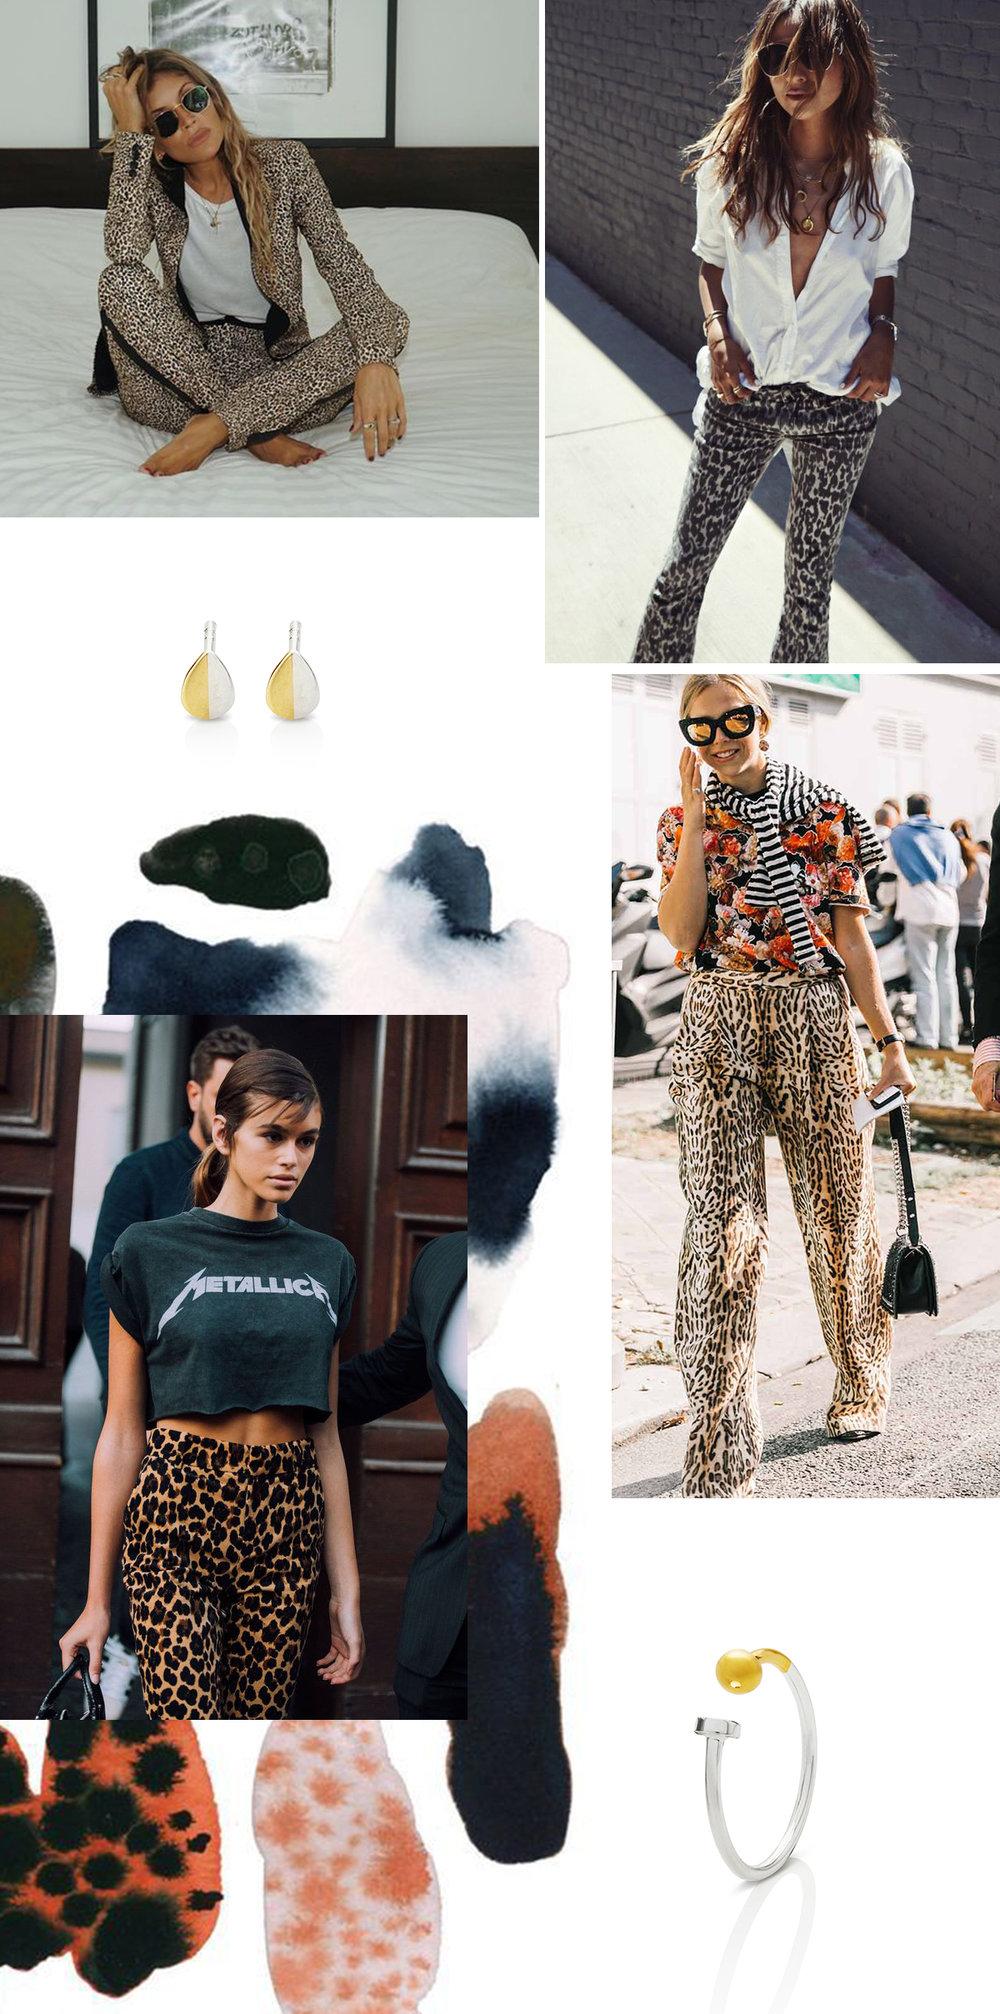 SN_StyleMood-Leopard.jpg